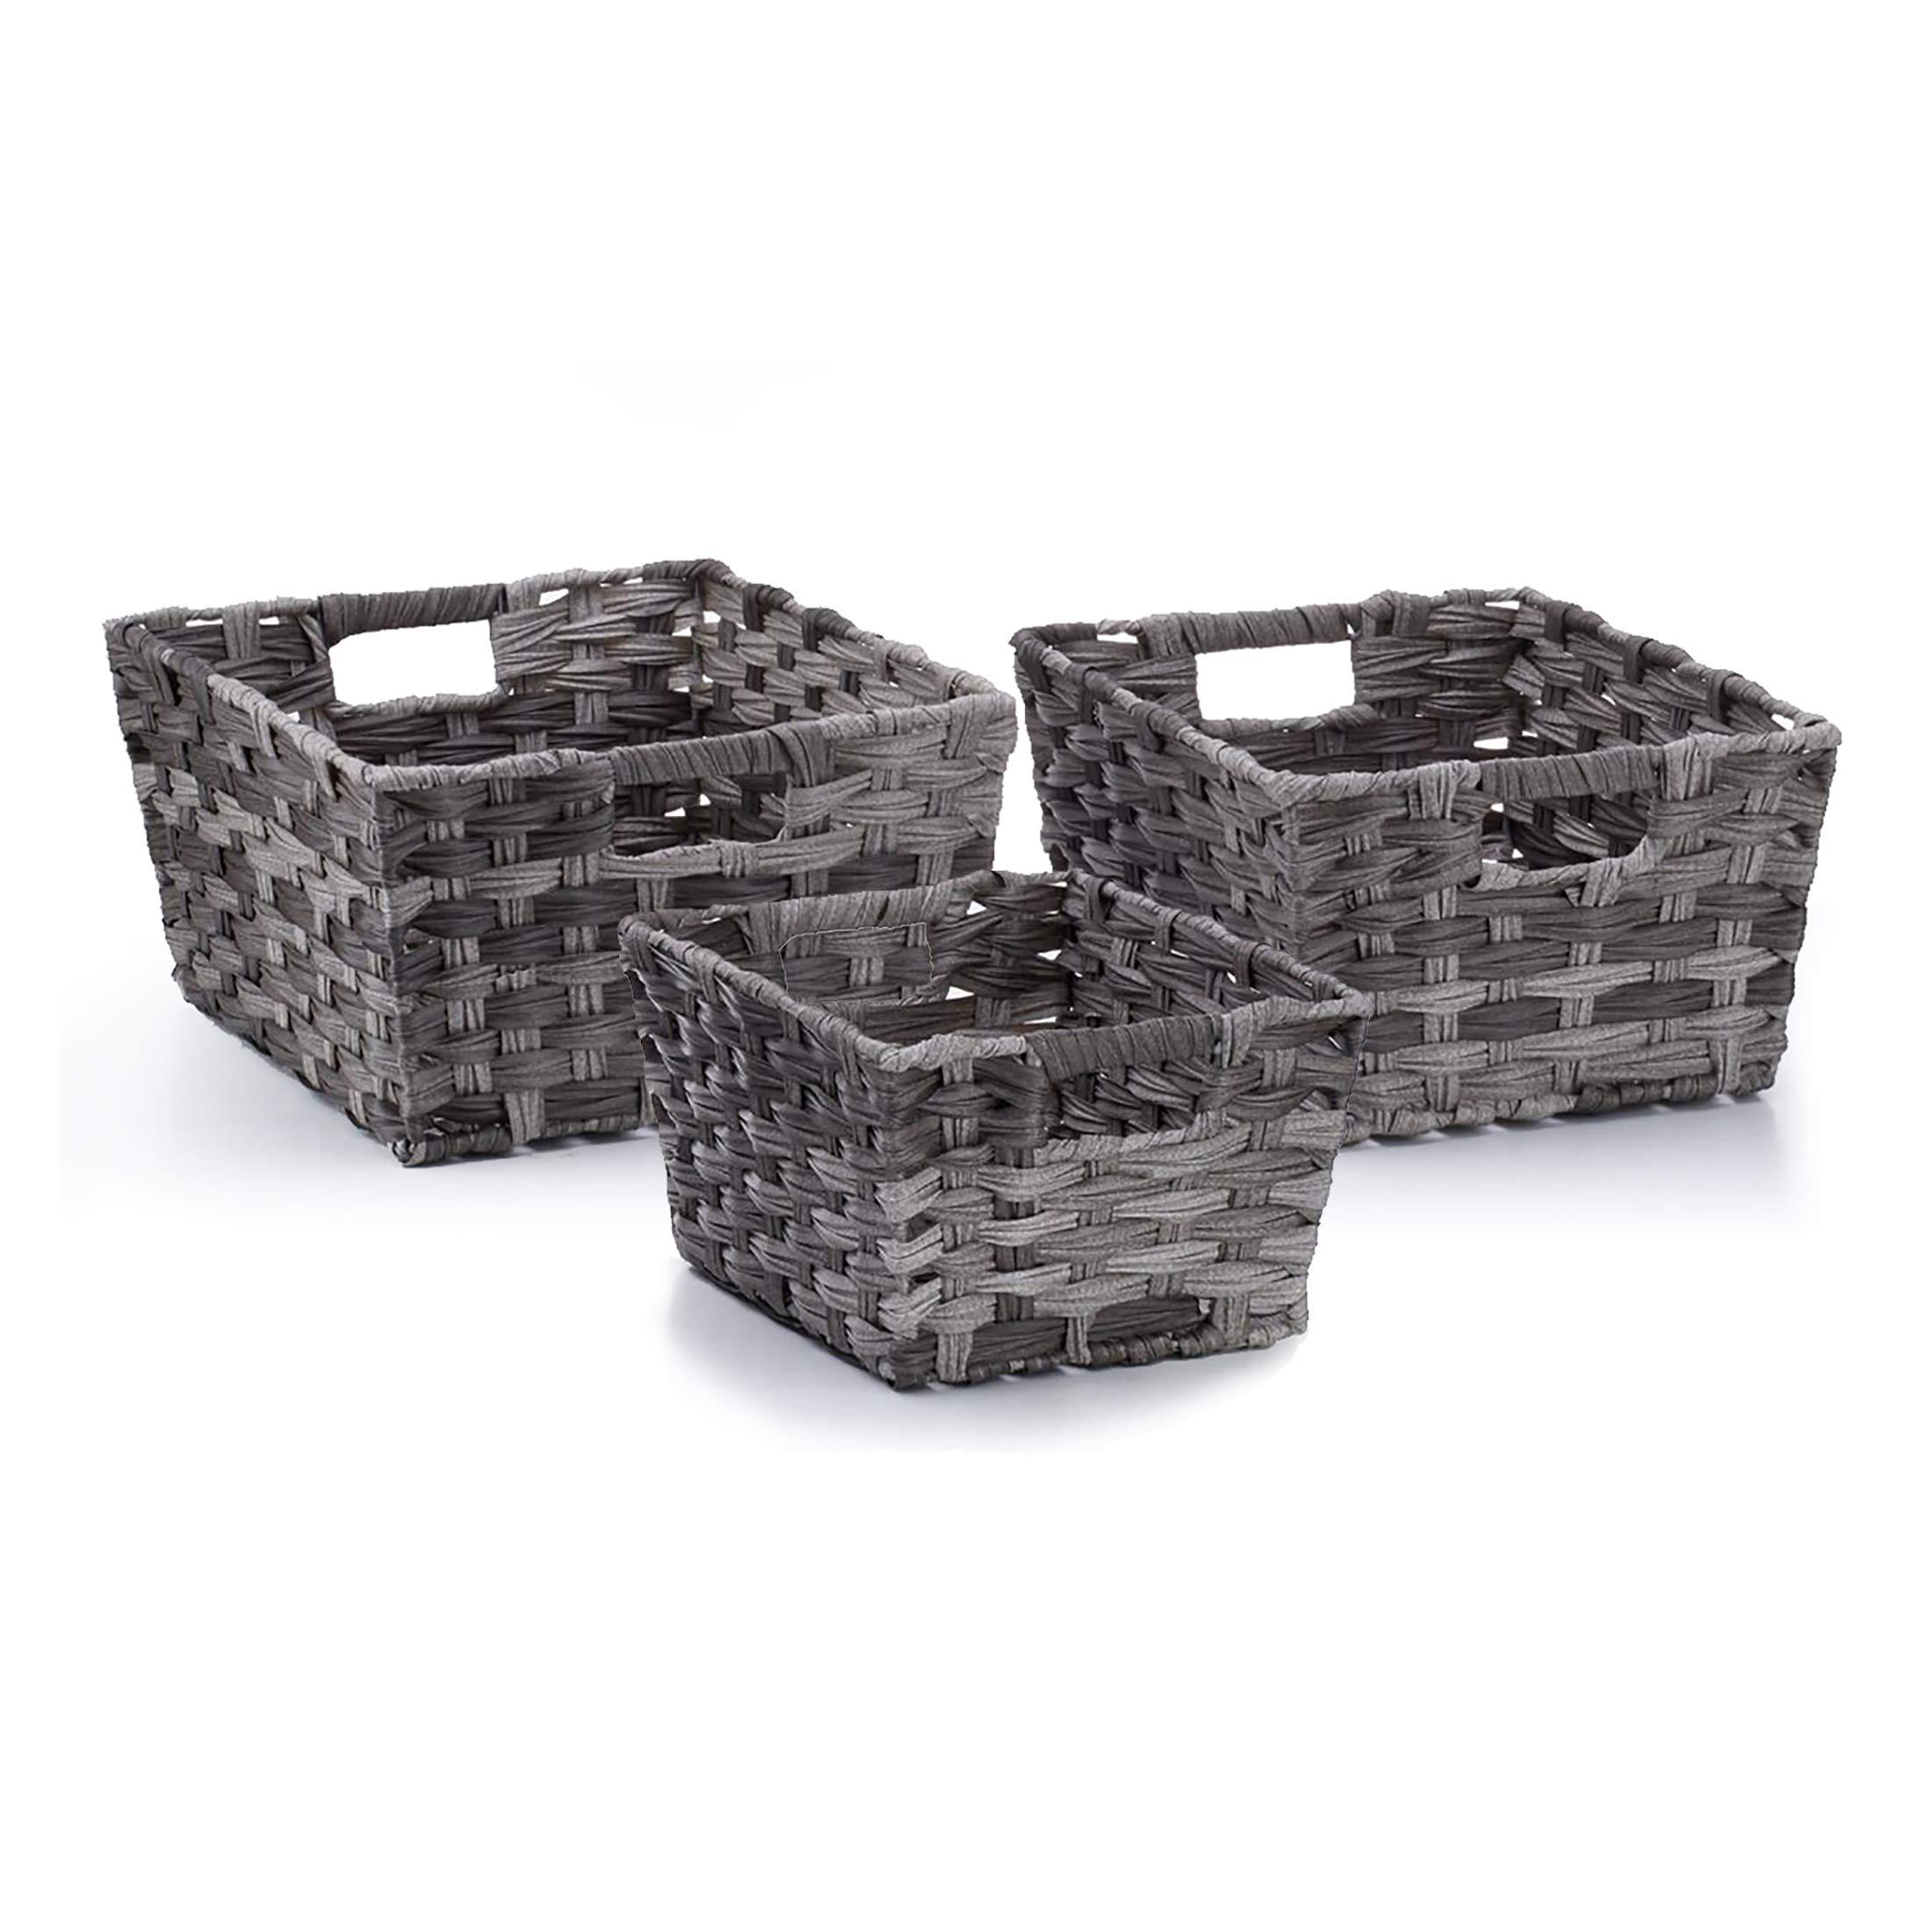 Seville Classics WEB498 Nesting Woven Rectangular Shelf Storage Basket Assortment (3-Piece Set), Granite Gray